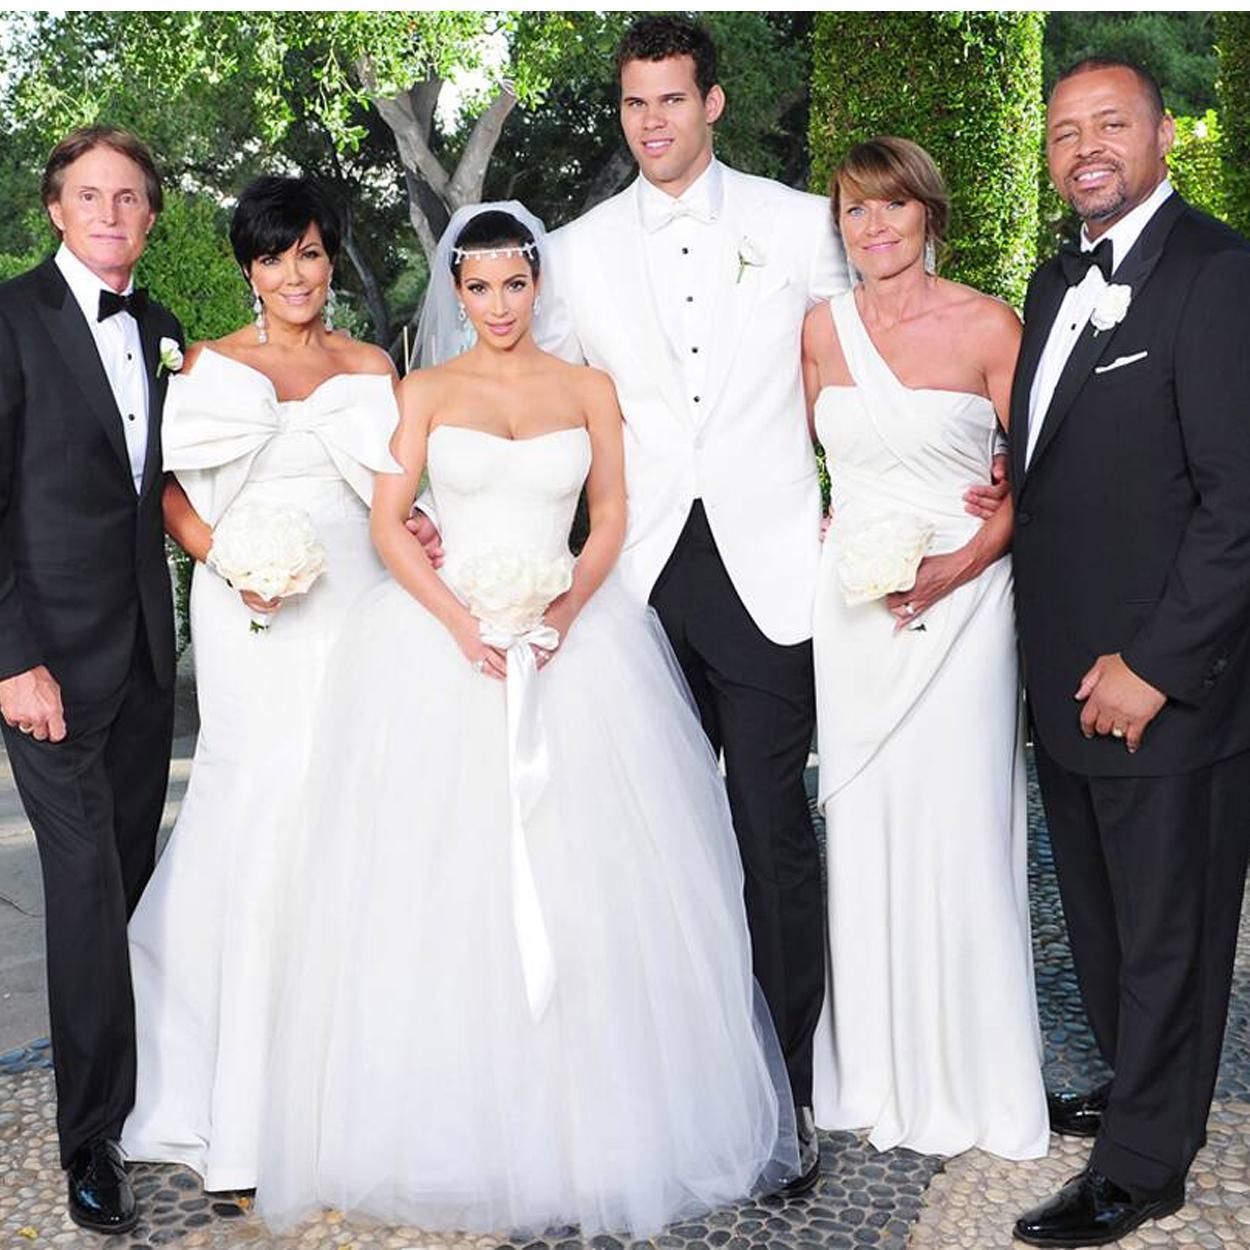 casamento relampago kim kardashian polemicas da familia